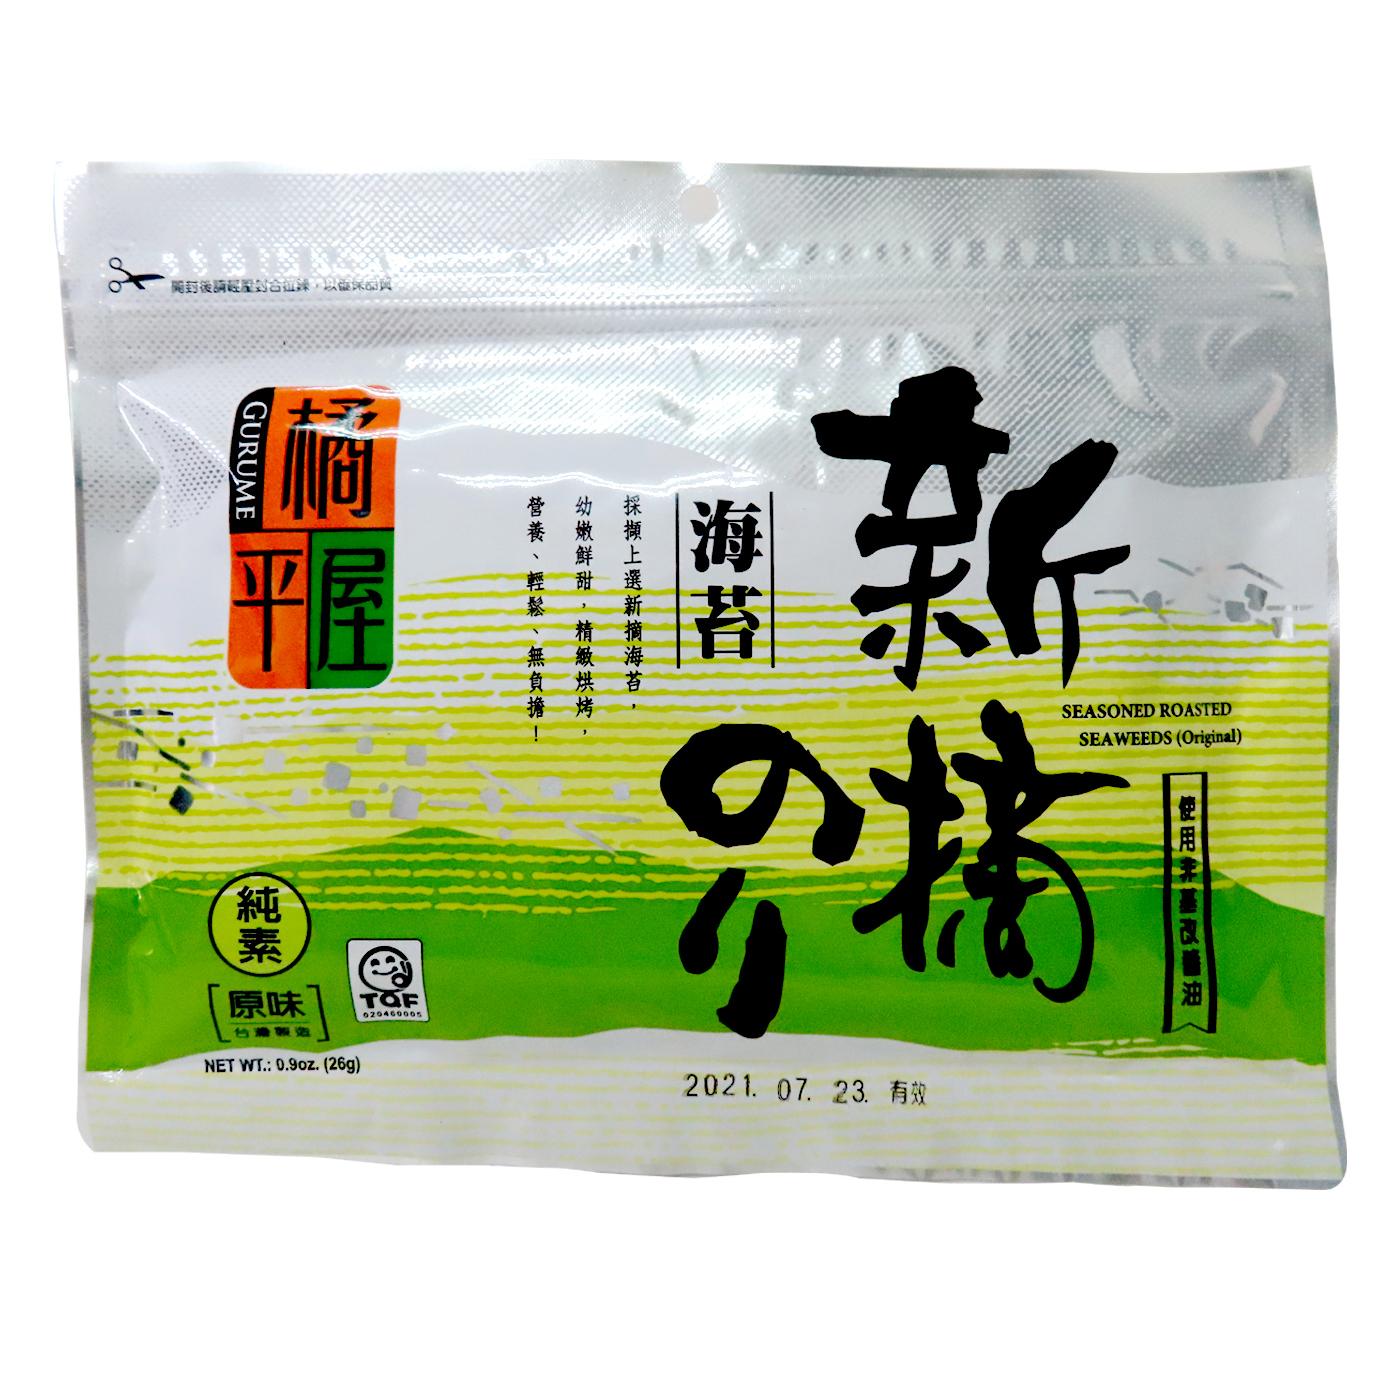 Image Abstract Seaweed 三味屋 - 新摘海苔 26 grams